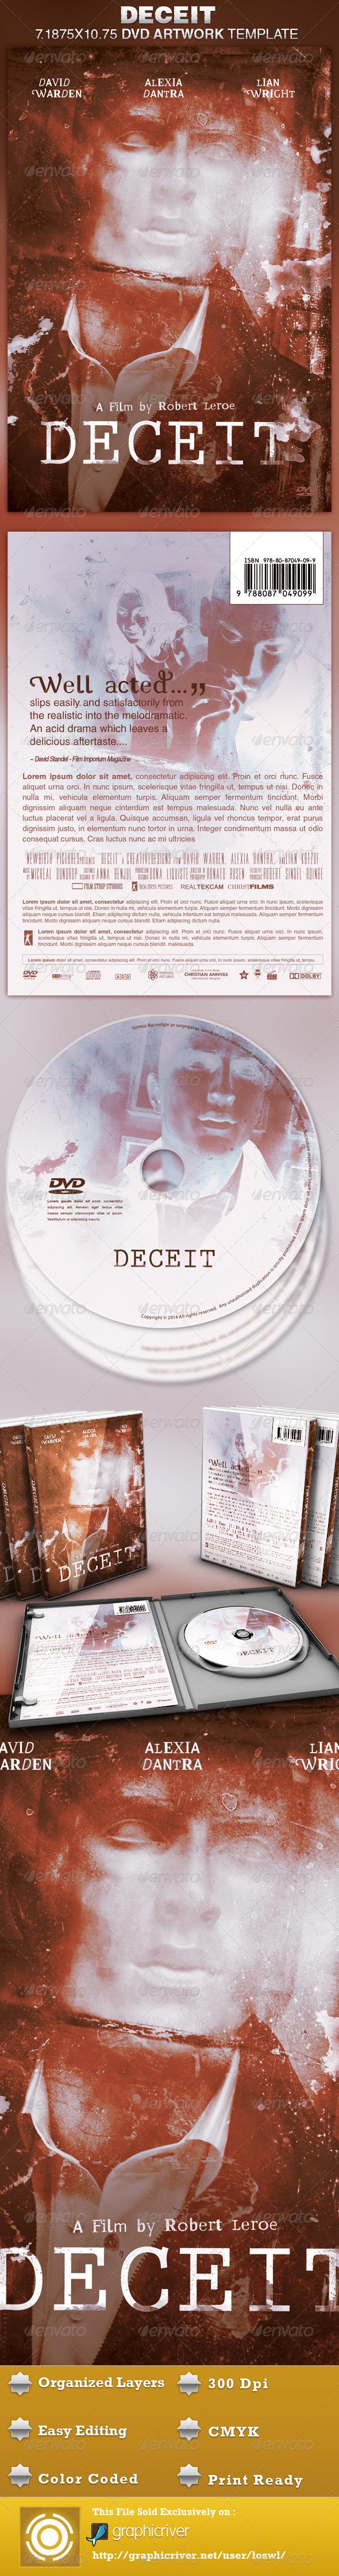 GraphicRiver Deceit DVD Artwork Template 4629500